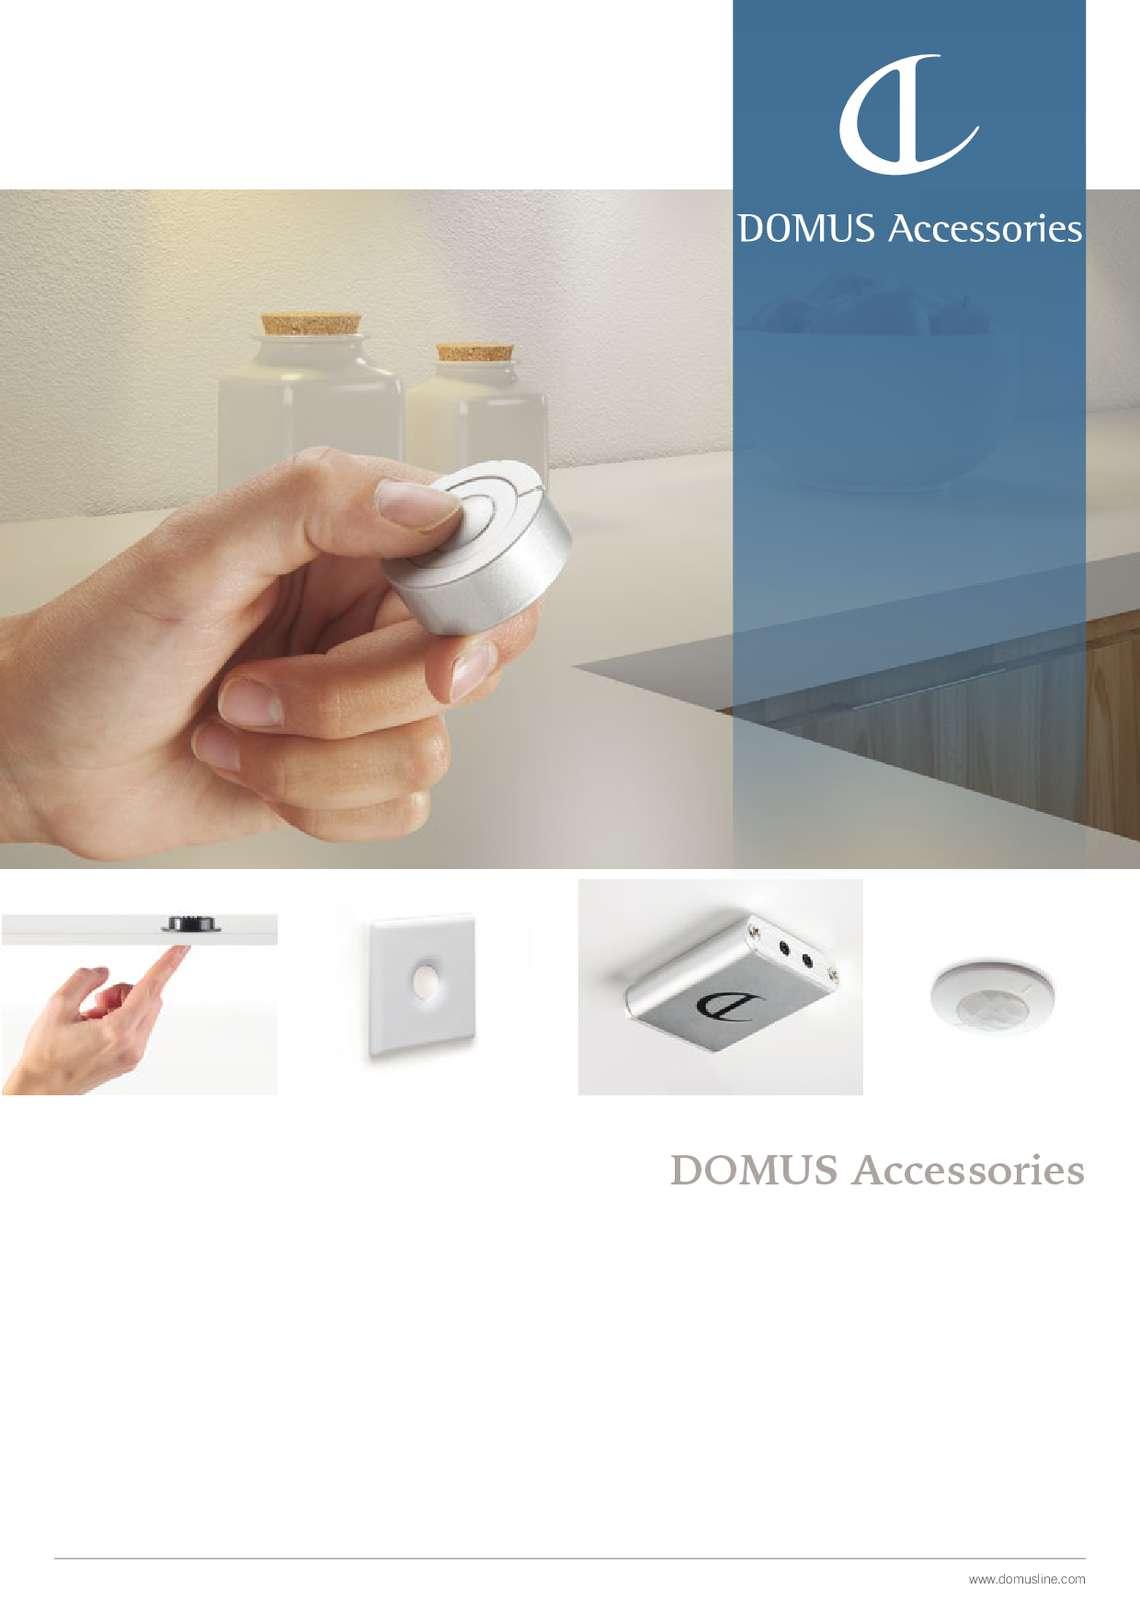 domus-line-illuminazione_26_073.jpg